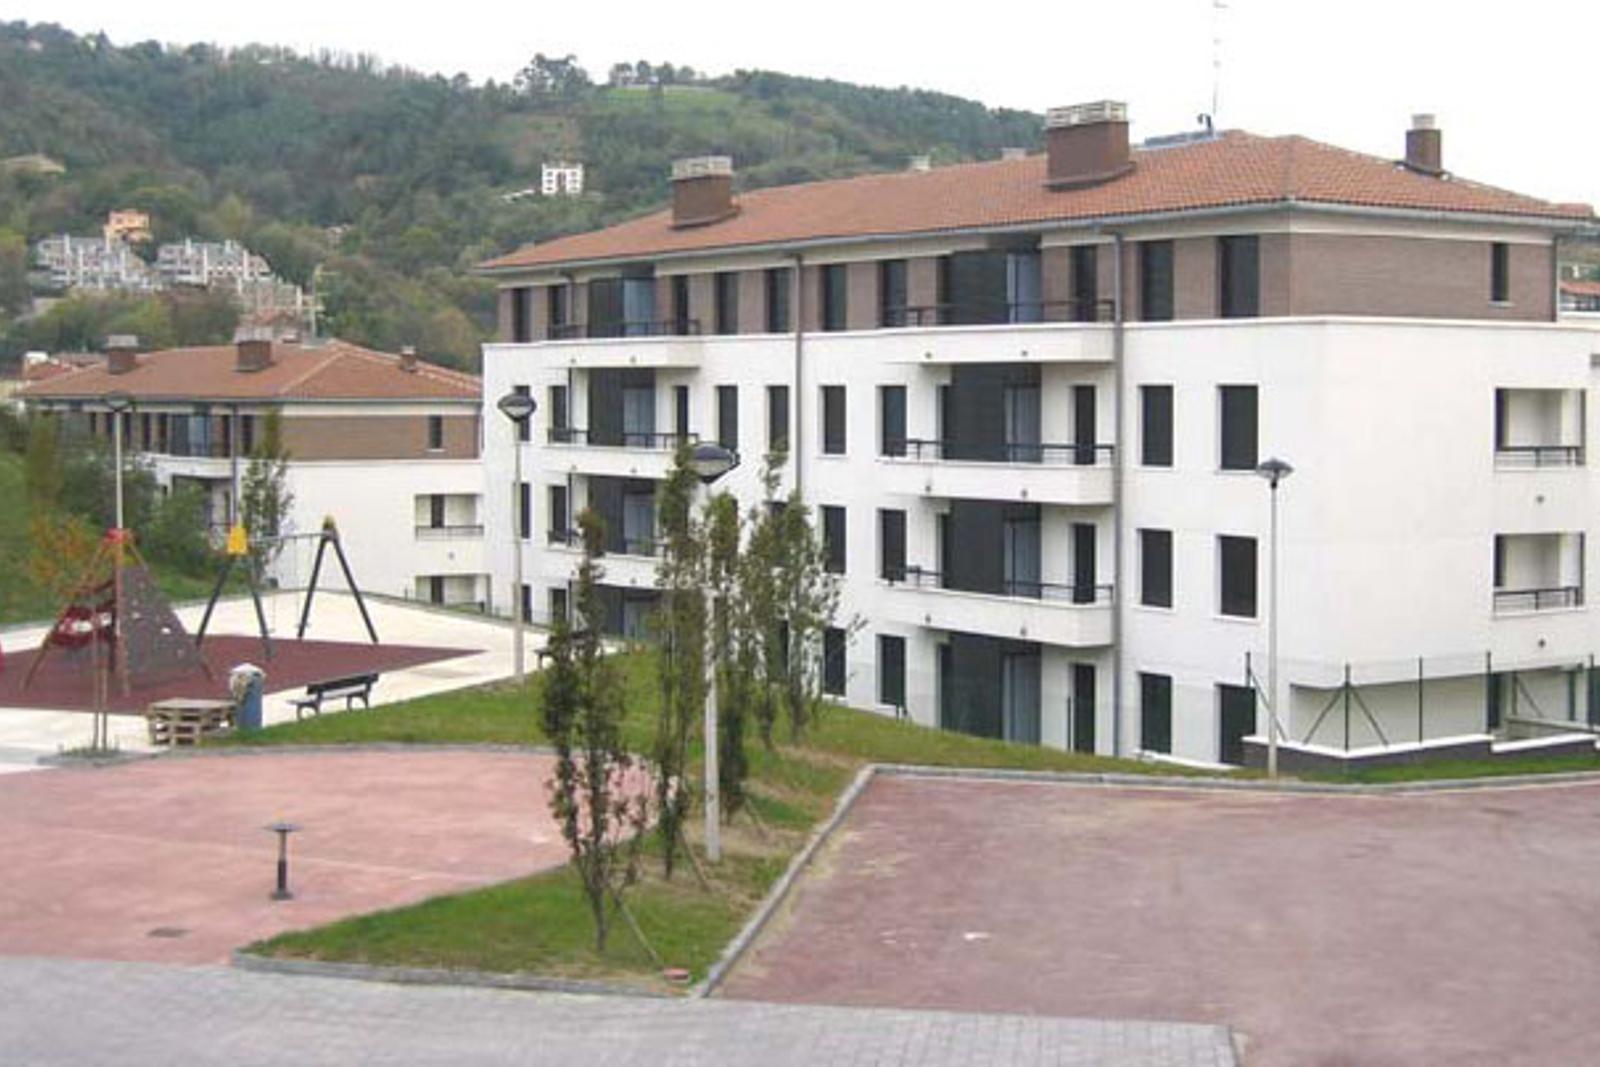 Viviendas en marrutxipi construcciones sukia for Piscina zabalgana